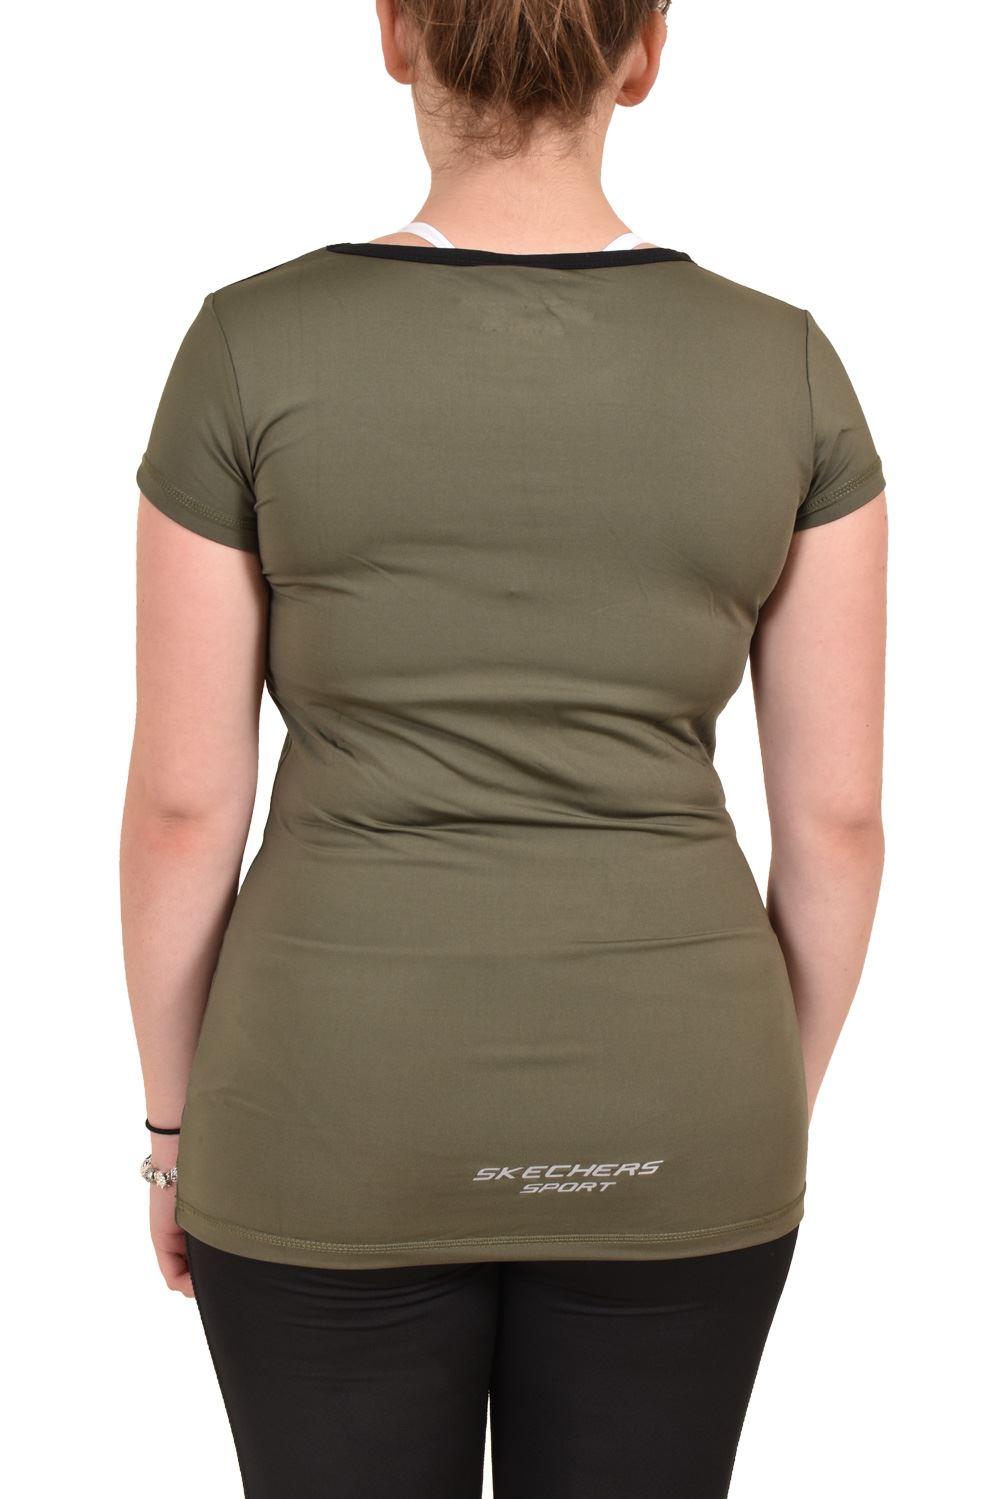 Camiseta-para-mujer-Skechers-Secado-Rapido-Top-senoras-de-Deportes-Activewear-Gimnasio-Fitness-Dance miniatura 8